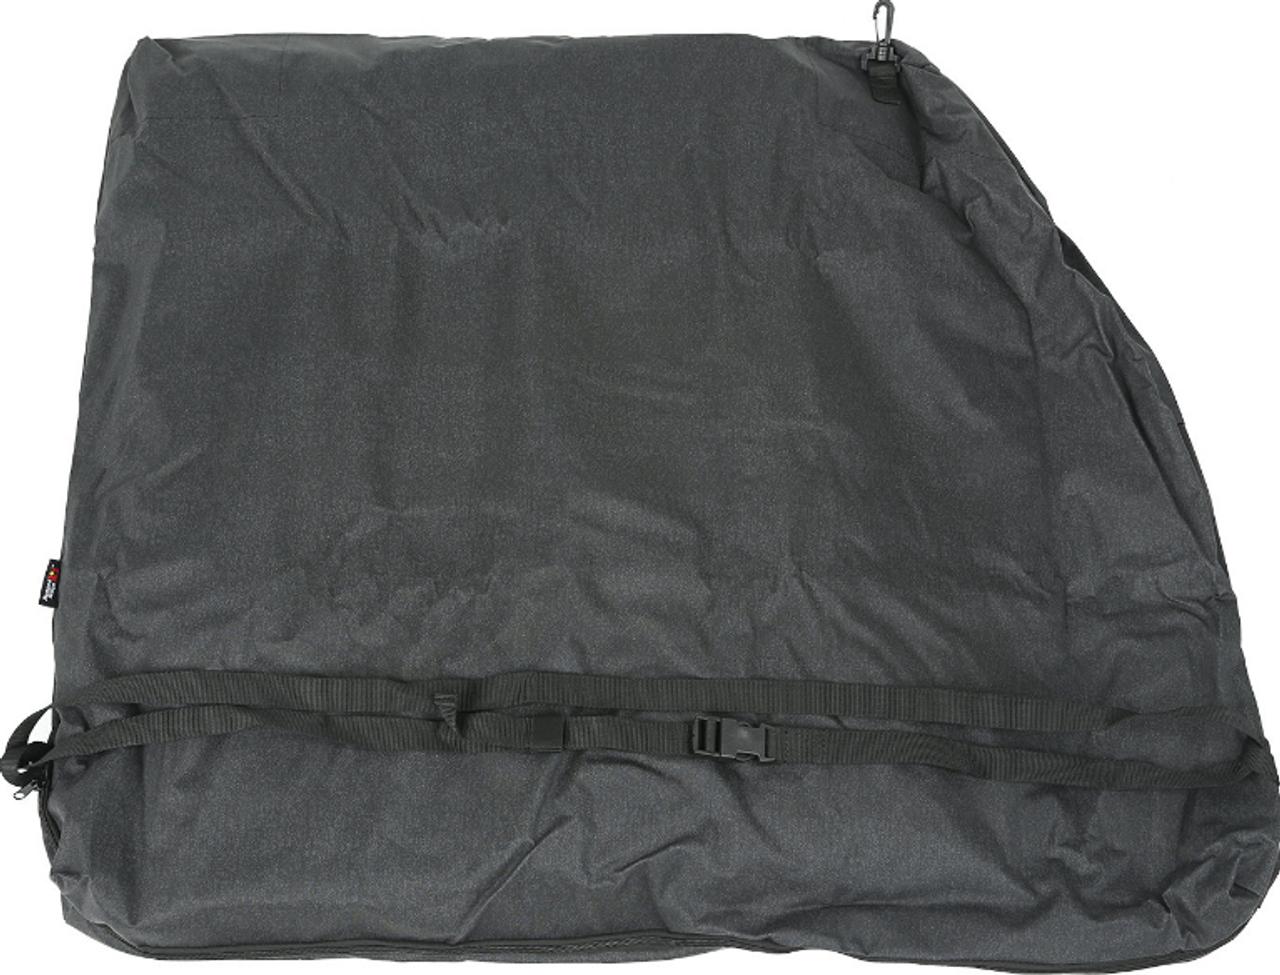 Rugged Ridge 12107.06 Freedom Panel Storage Bag for Jeep Wrangler JK, JL & Gladiator JT 2007+